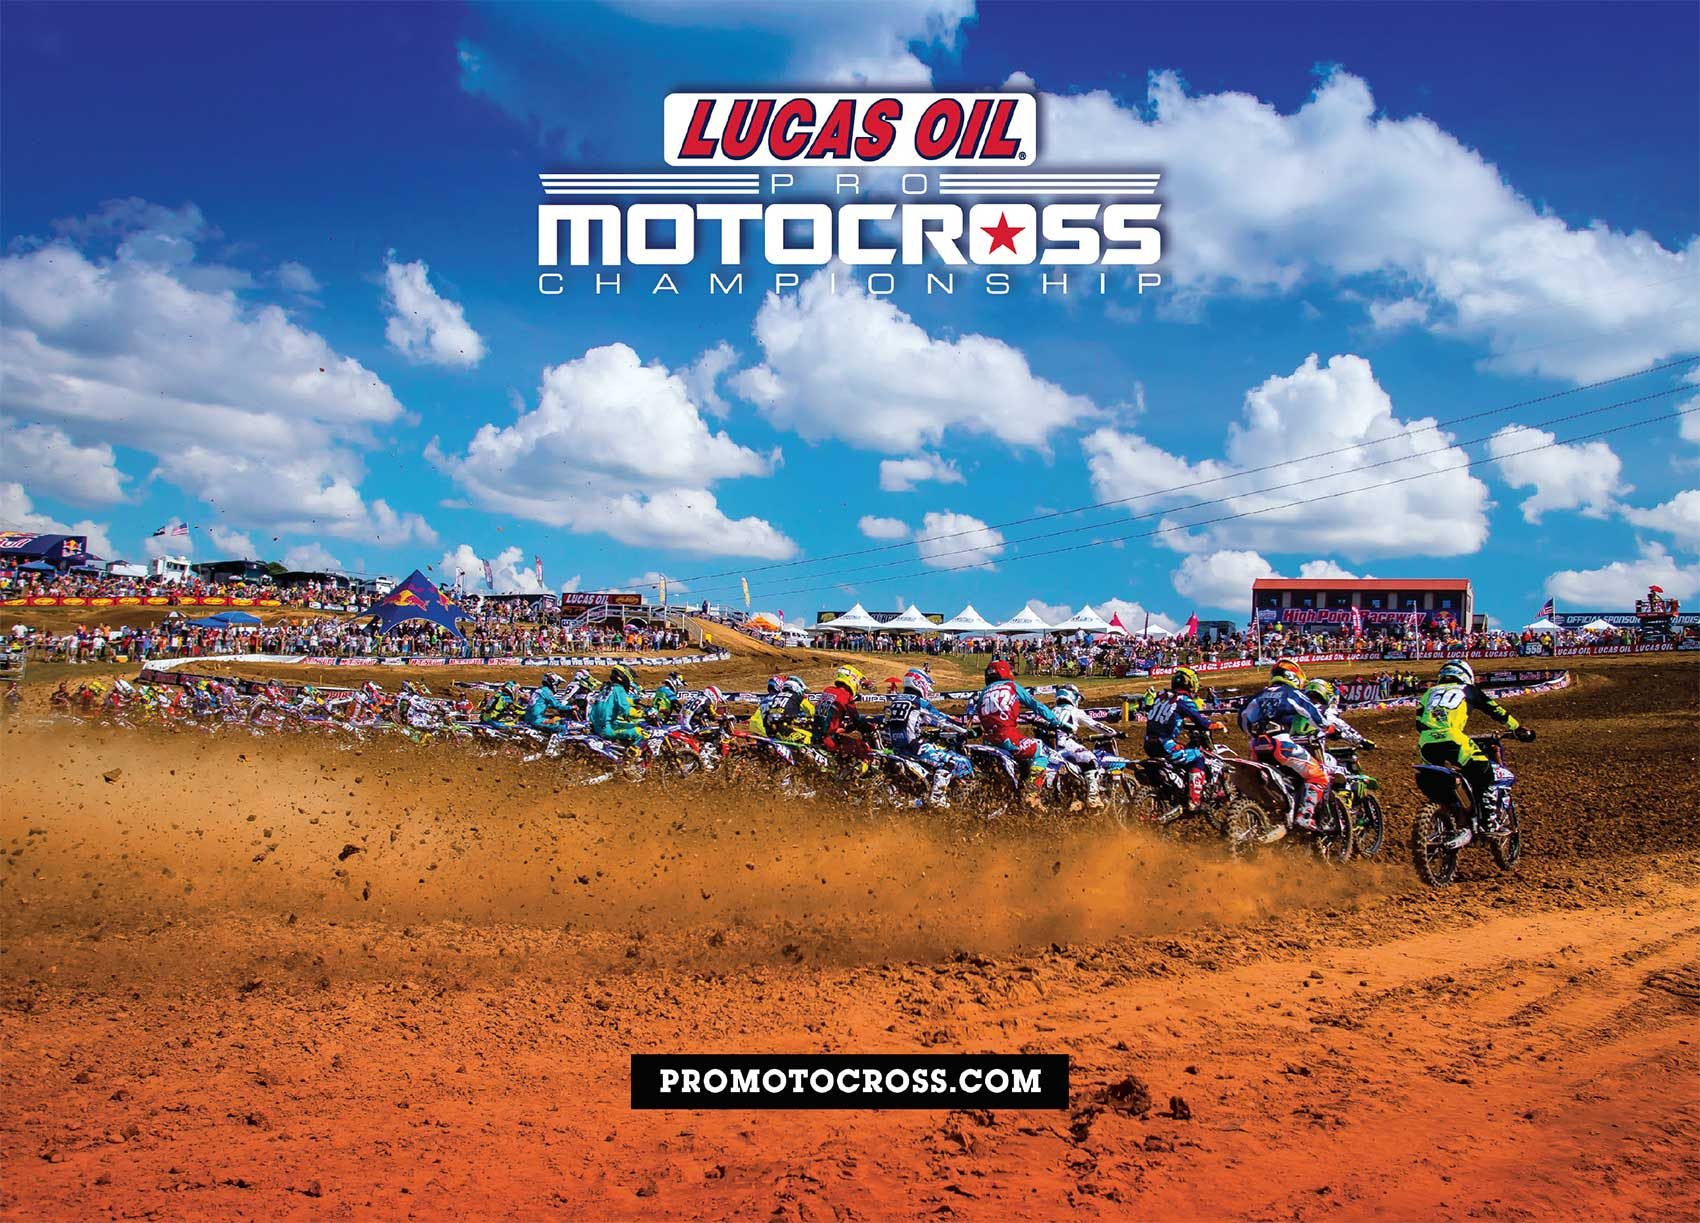 Racer X May 2019 - Lucas Oil Advertisement